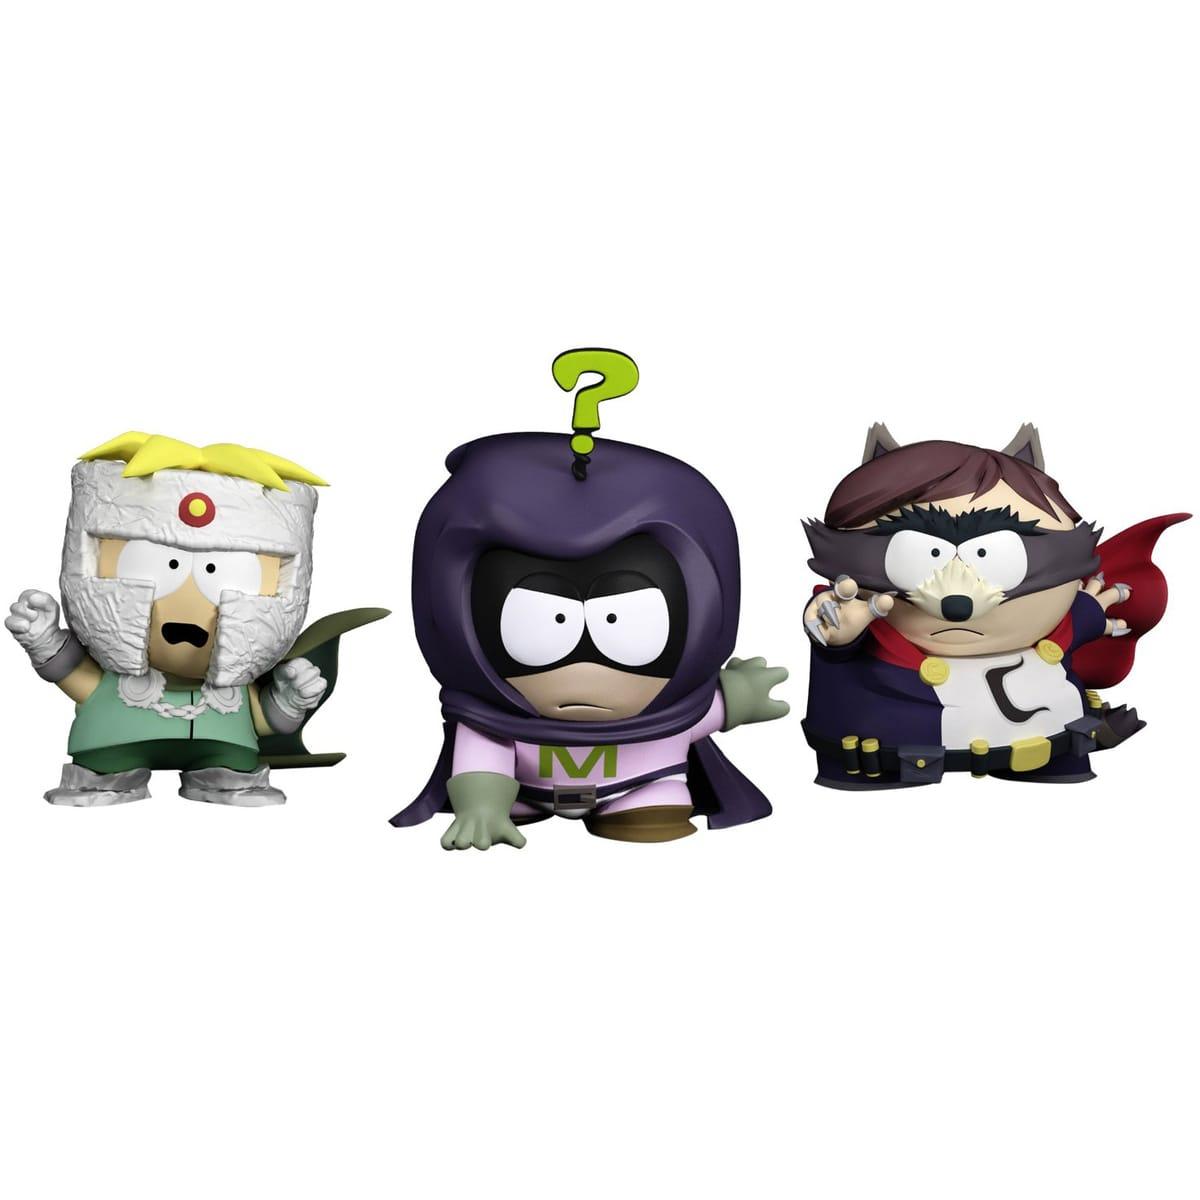 Pack 3 Figurines South Park (Le Coon, Mysterion, Professeur Chaos)